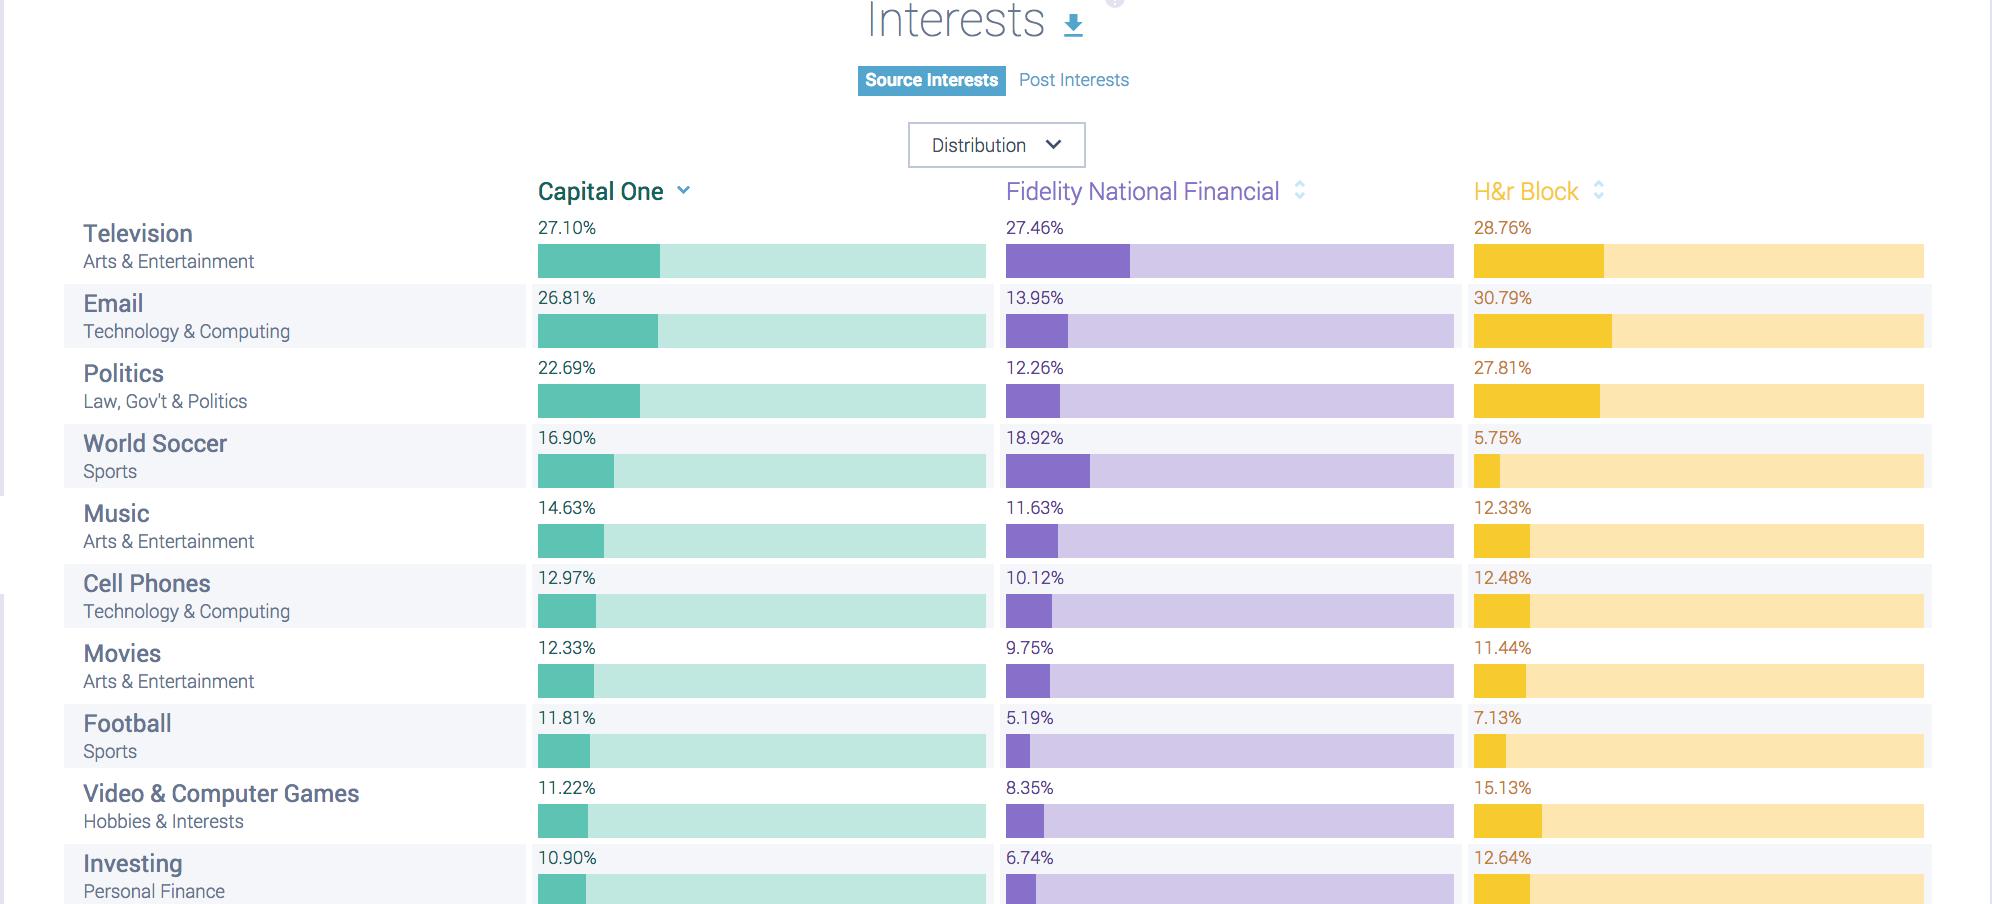 Financial Brands Interests Data